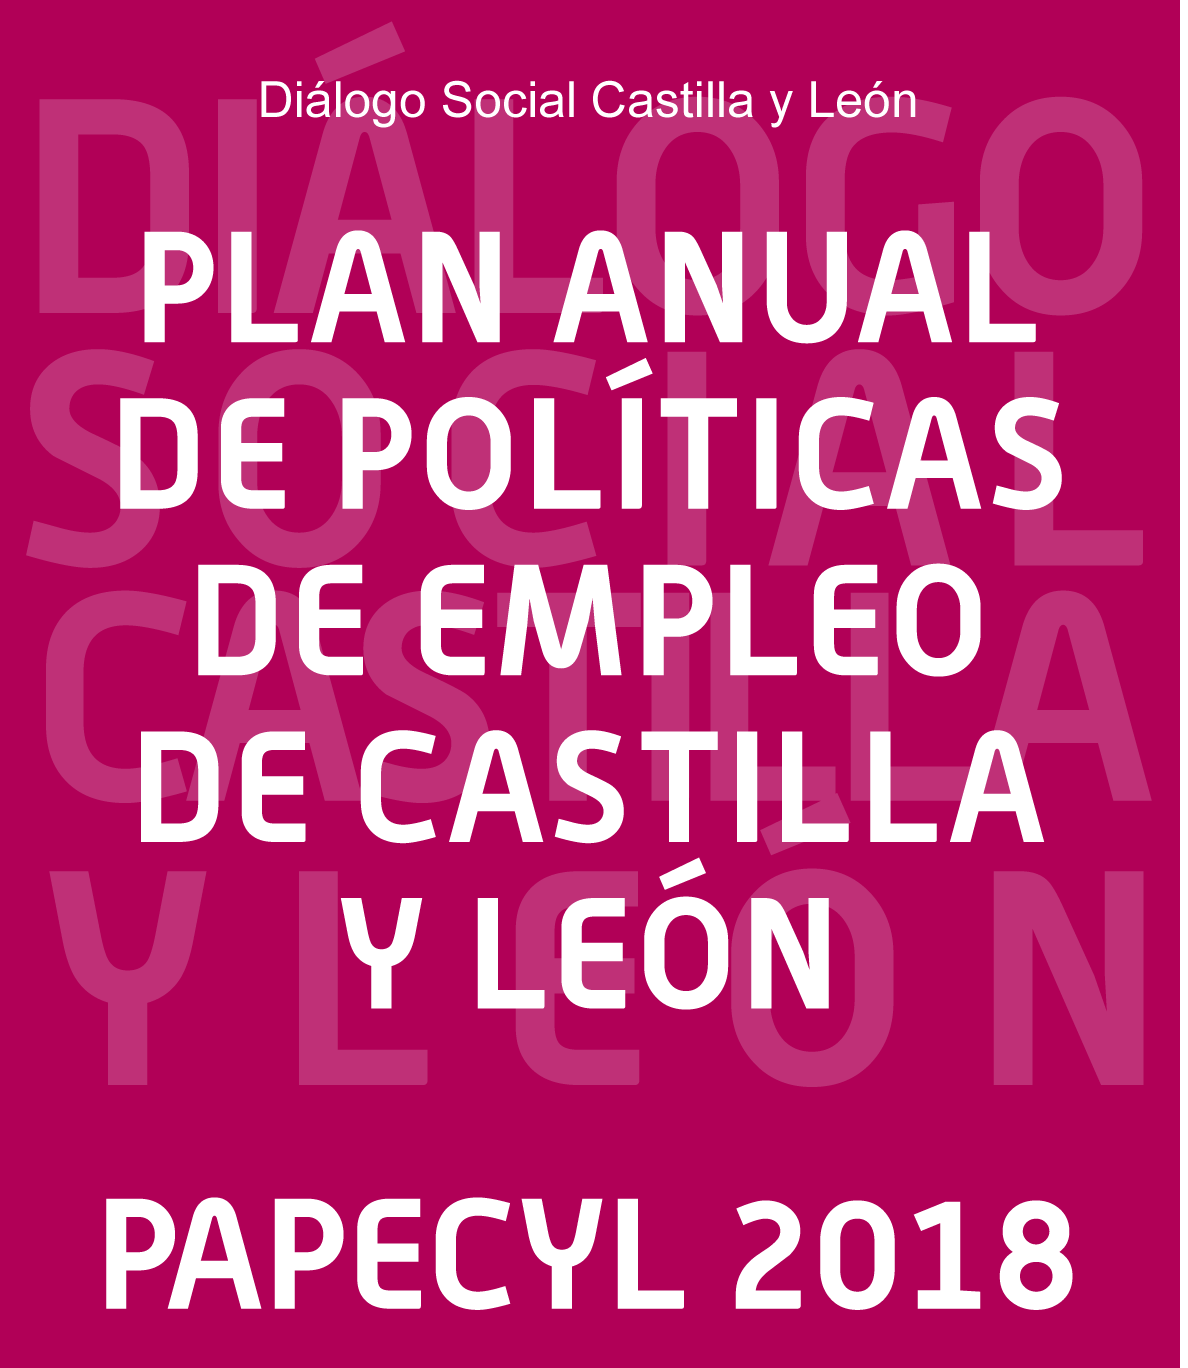 PAPECYL 2018